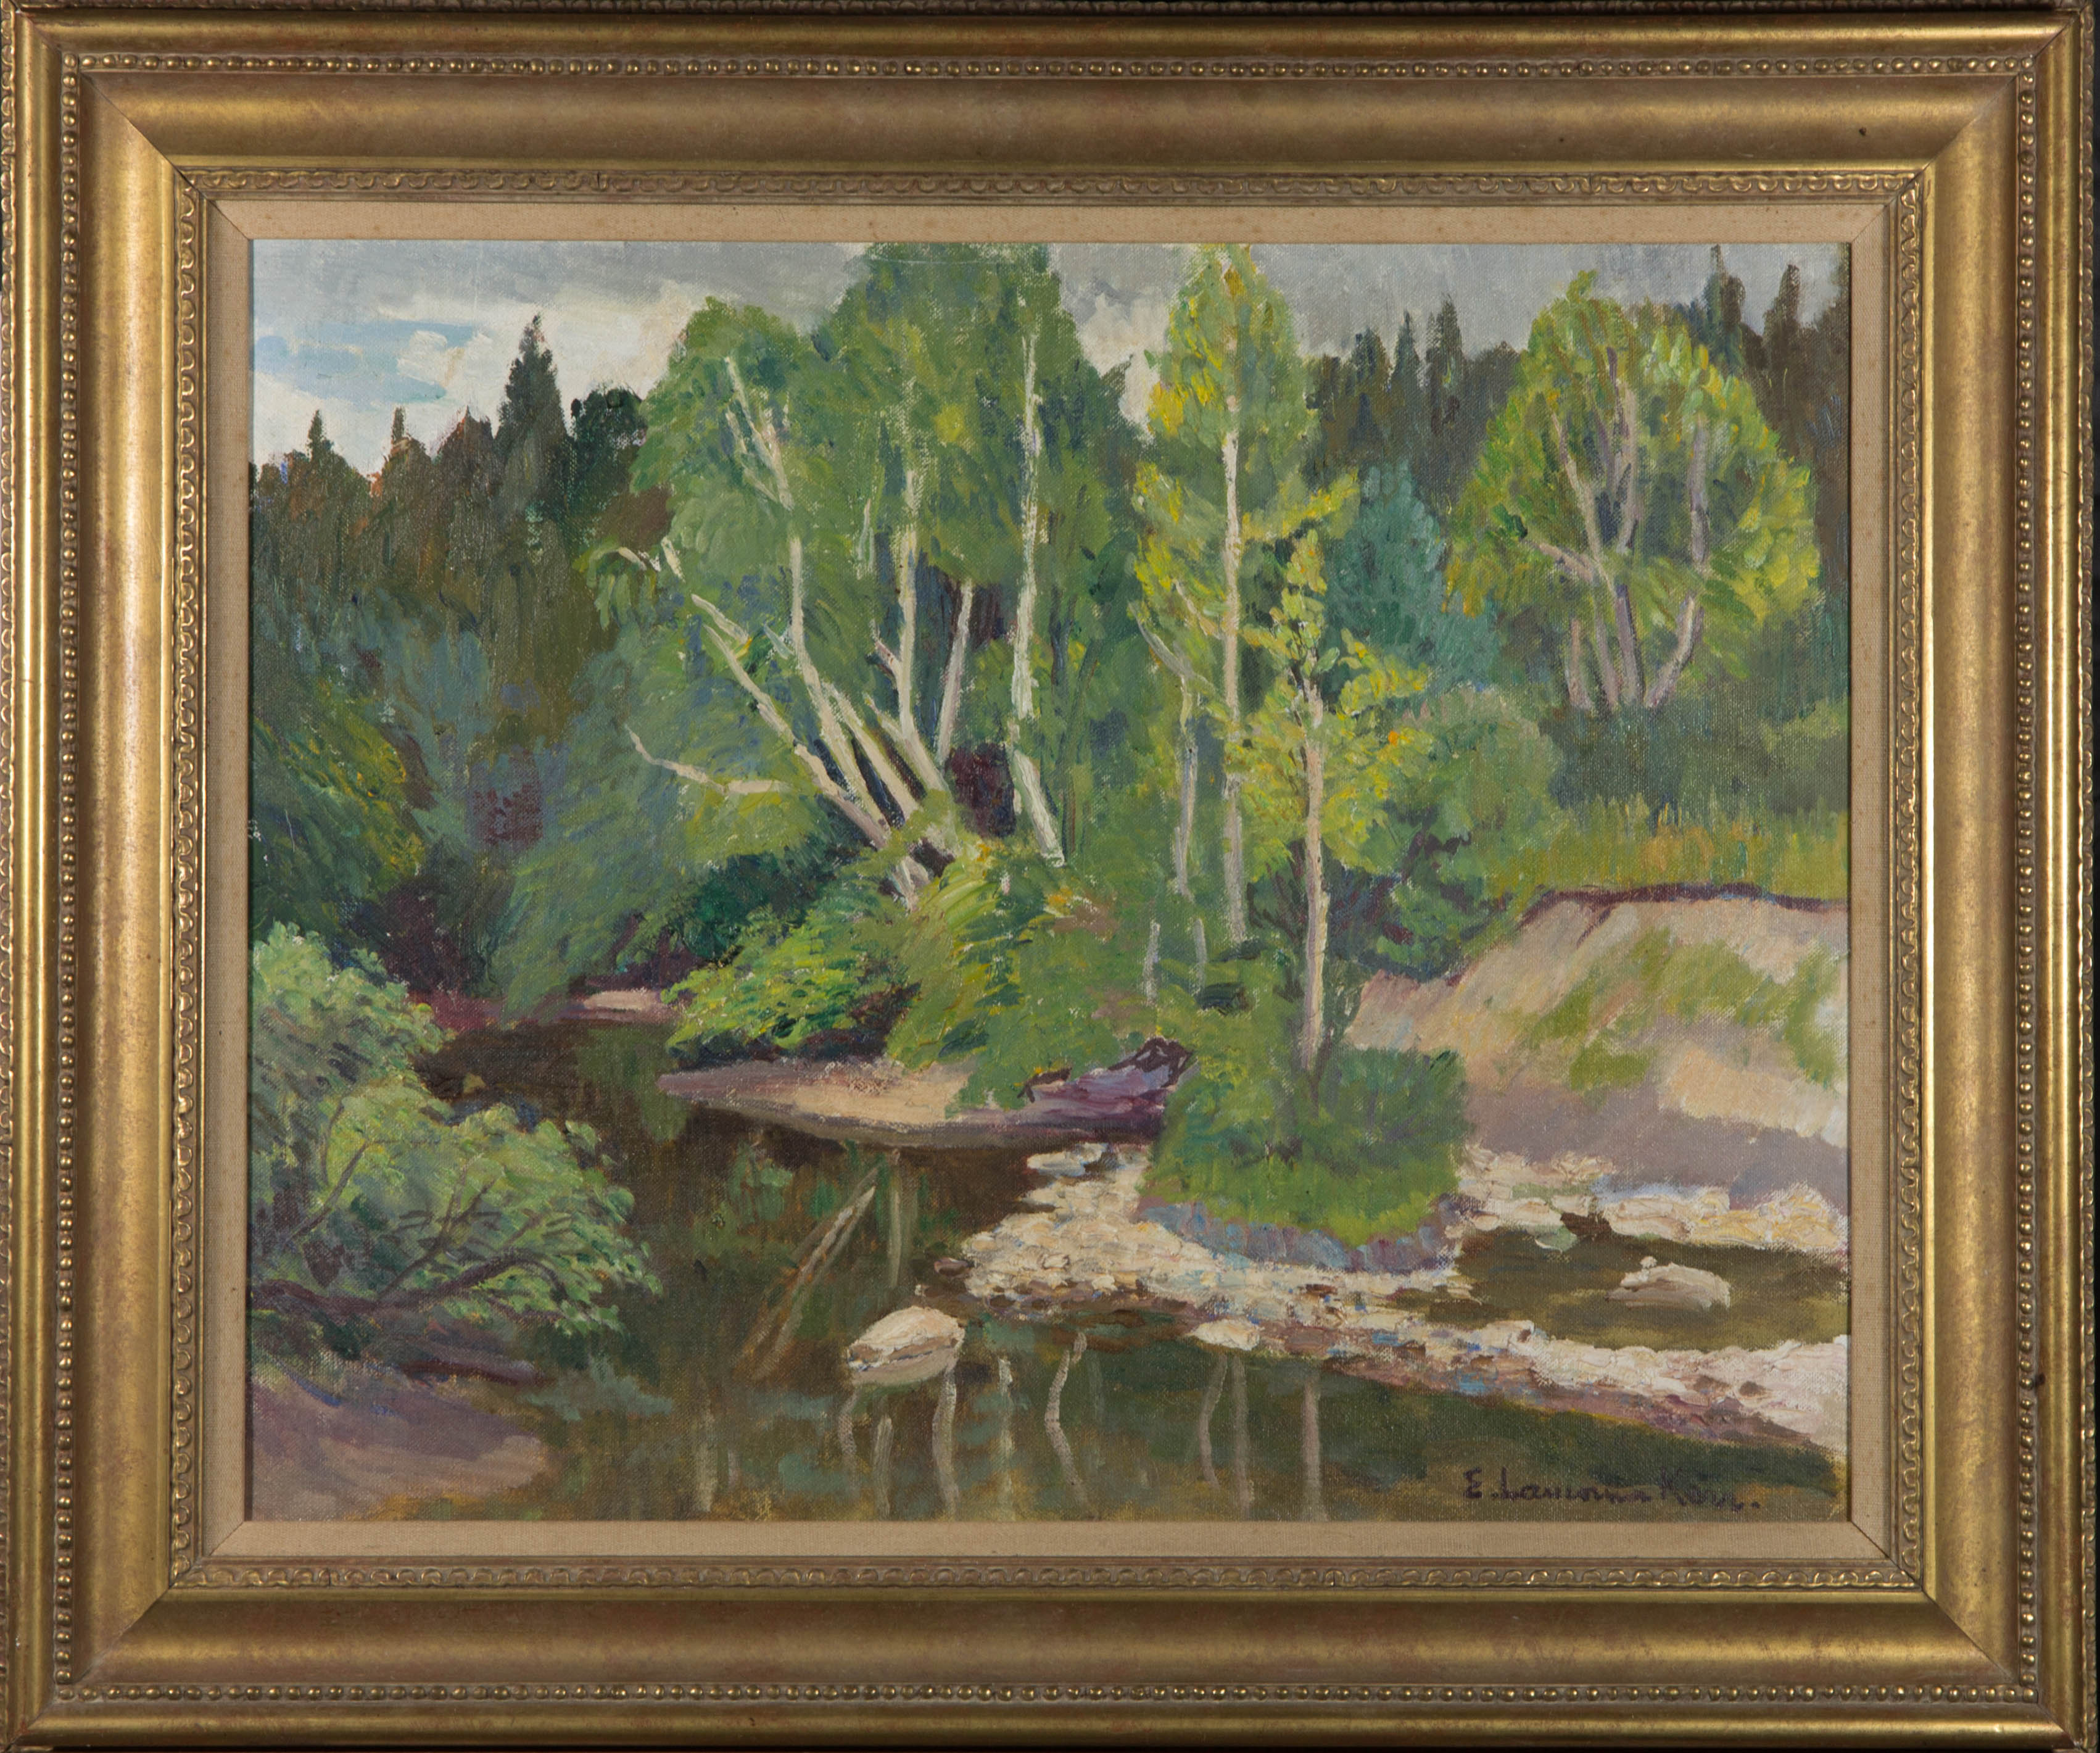 Elizabeth Lamoma Kerr (1905-1990) - Signed & Framed Mid 20th Century Oil, Creek